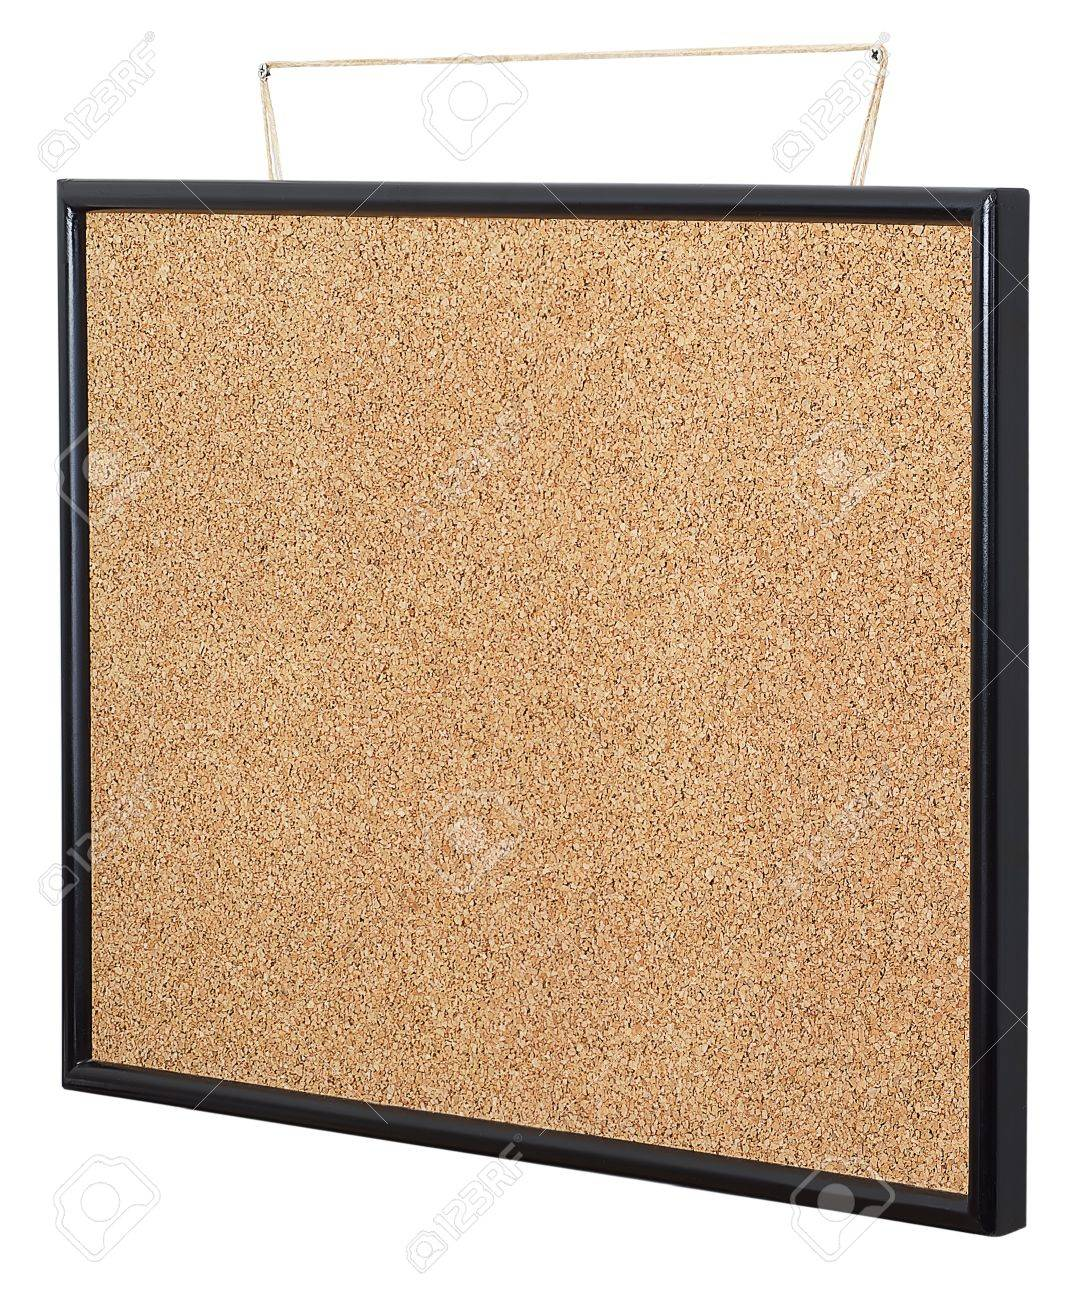 Empty cork board hanging Stock Photo - 15968245